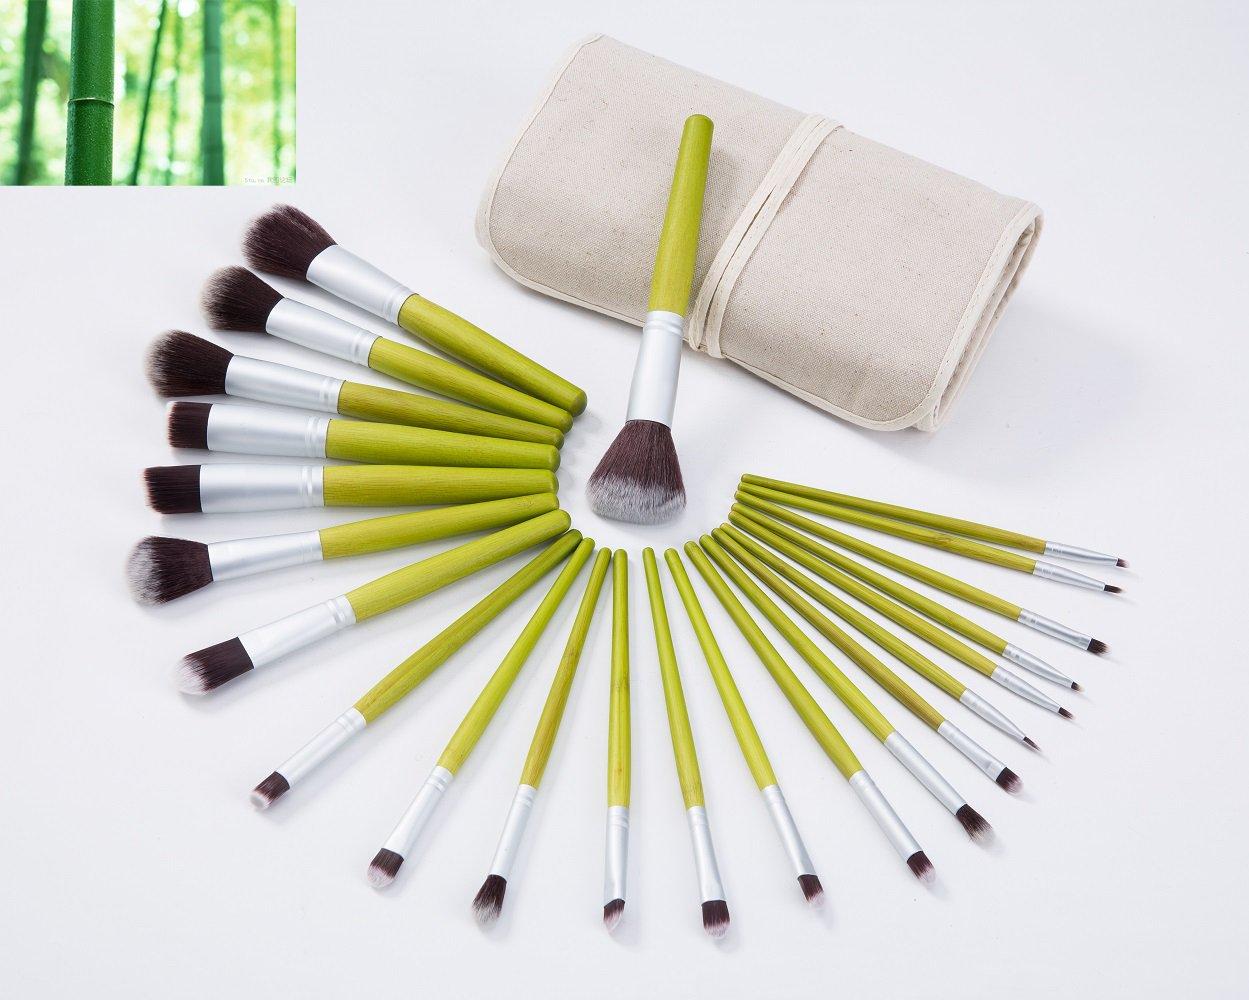 LaiFeiYa - Professional 23Pcs Bamboo Handle Kabuki Makeup Brushes Cosmetics Set Kit for Beauty Liquid Foundation Cream Concealer Contour Blending Powder Eyeshadow Eyebrow Brush